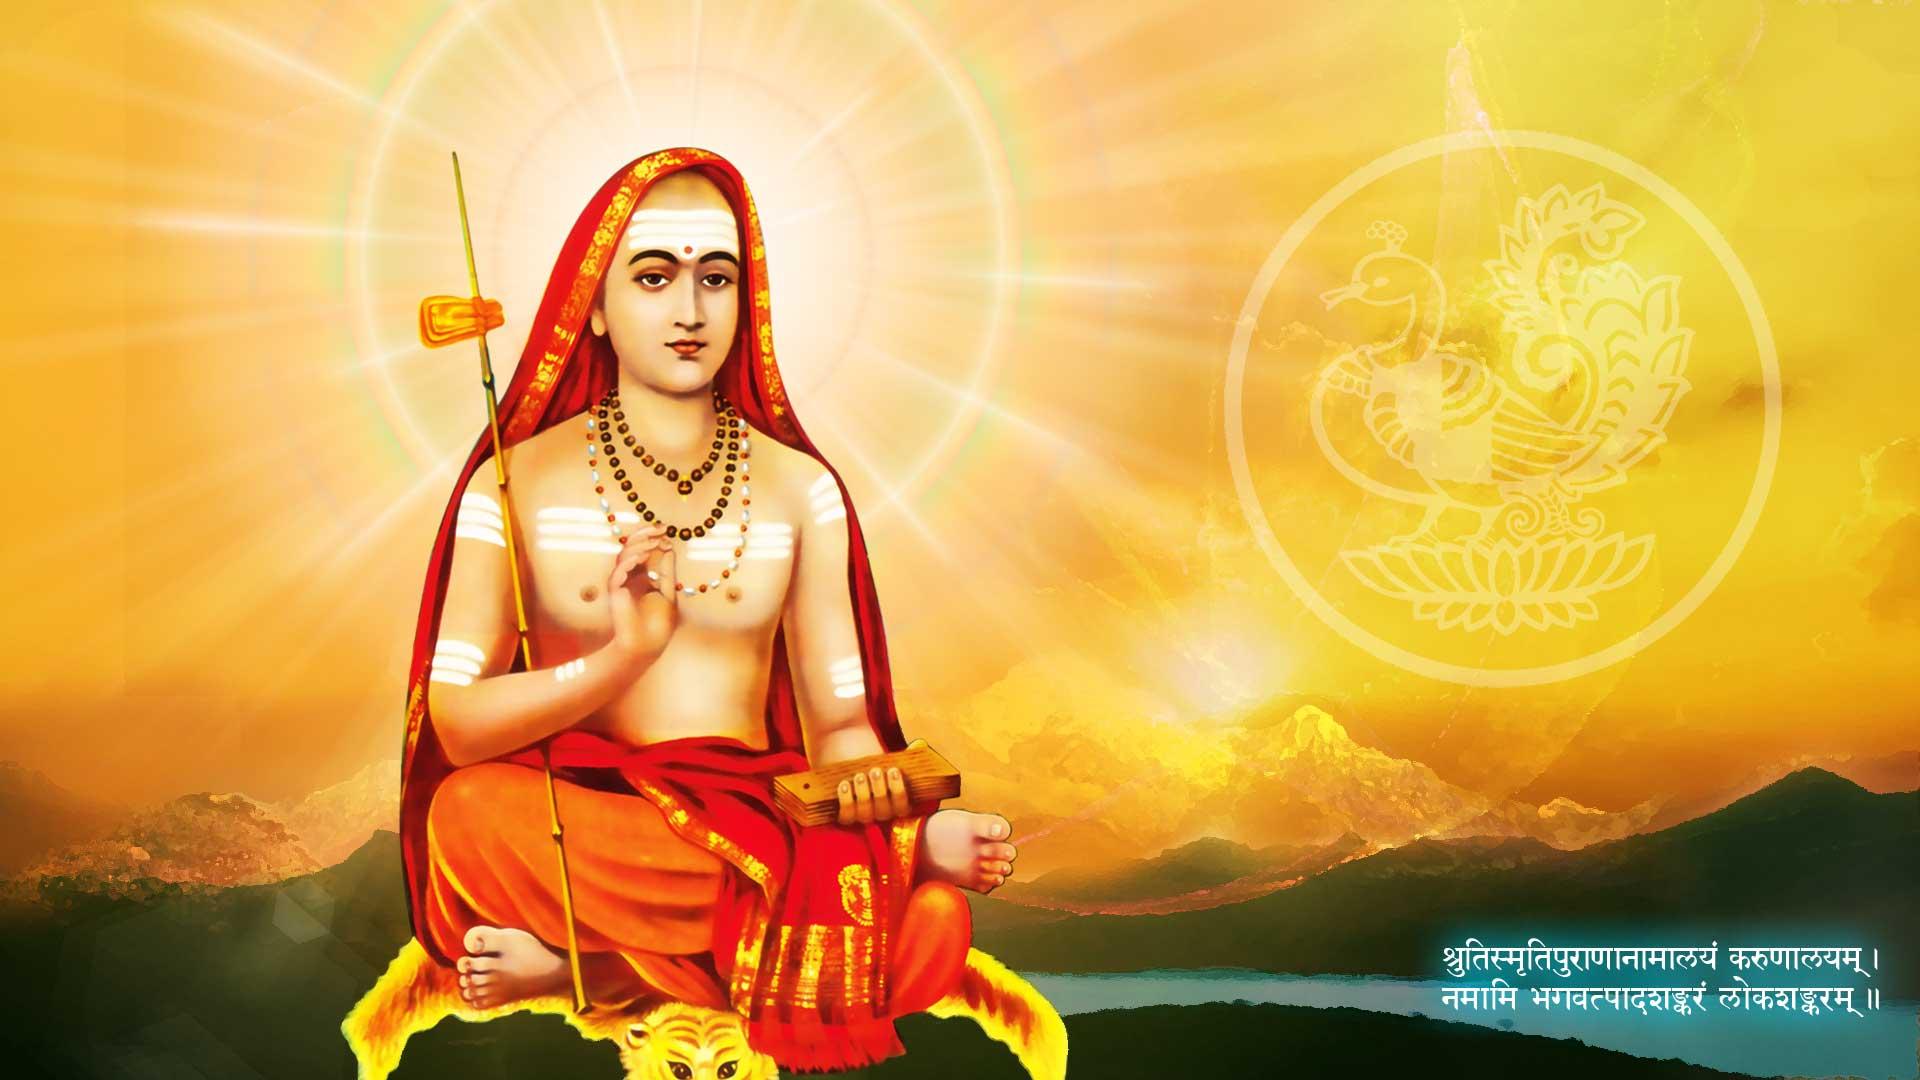 Happy Adi Shankaracharya Jayanti Wallpapers for Free Download